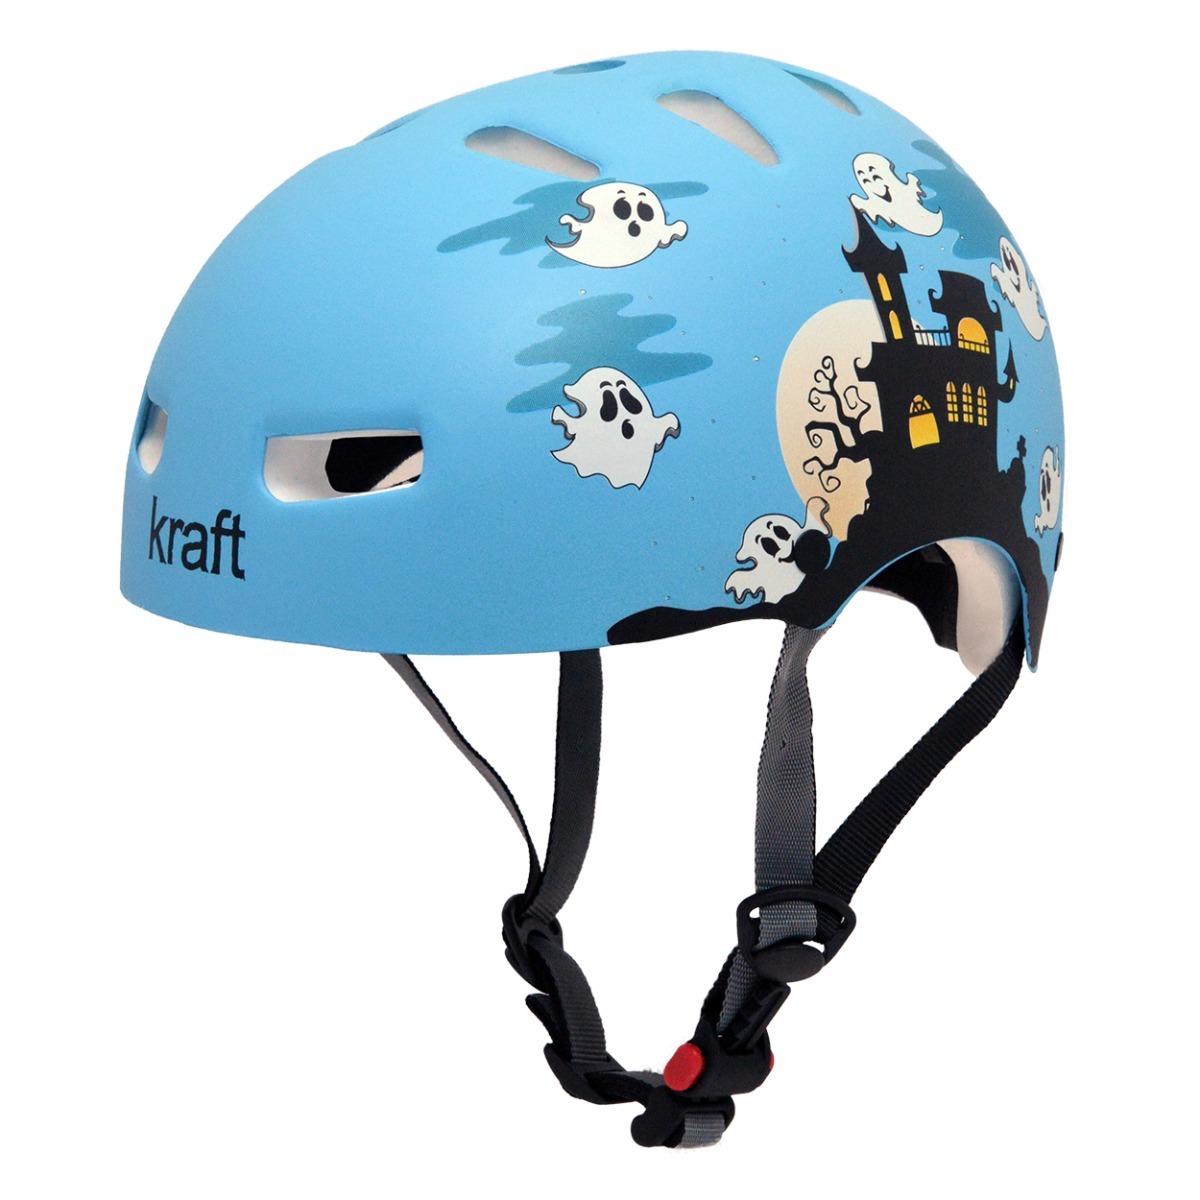 Capacete Kraft Bike c1827f6f5c1